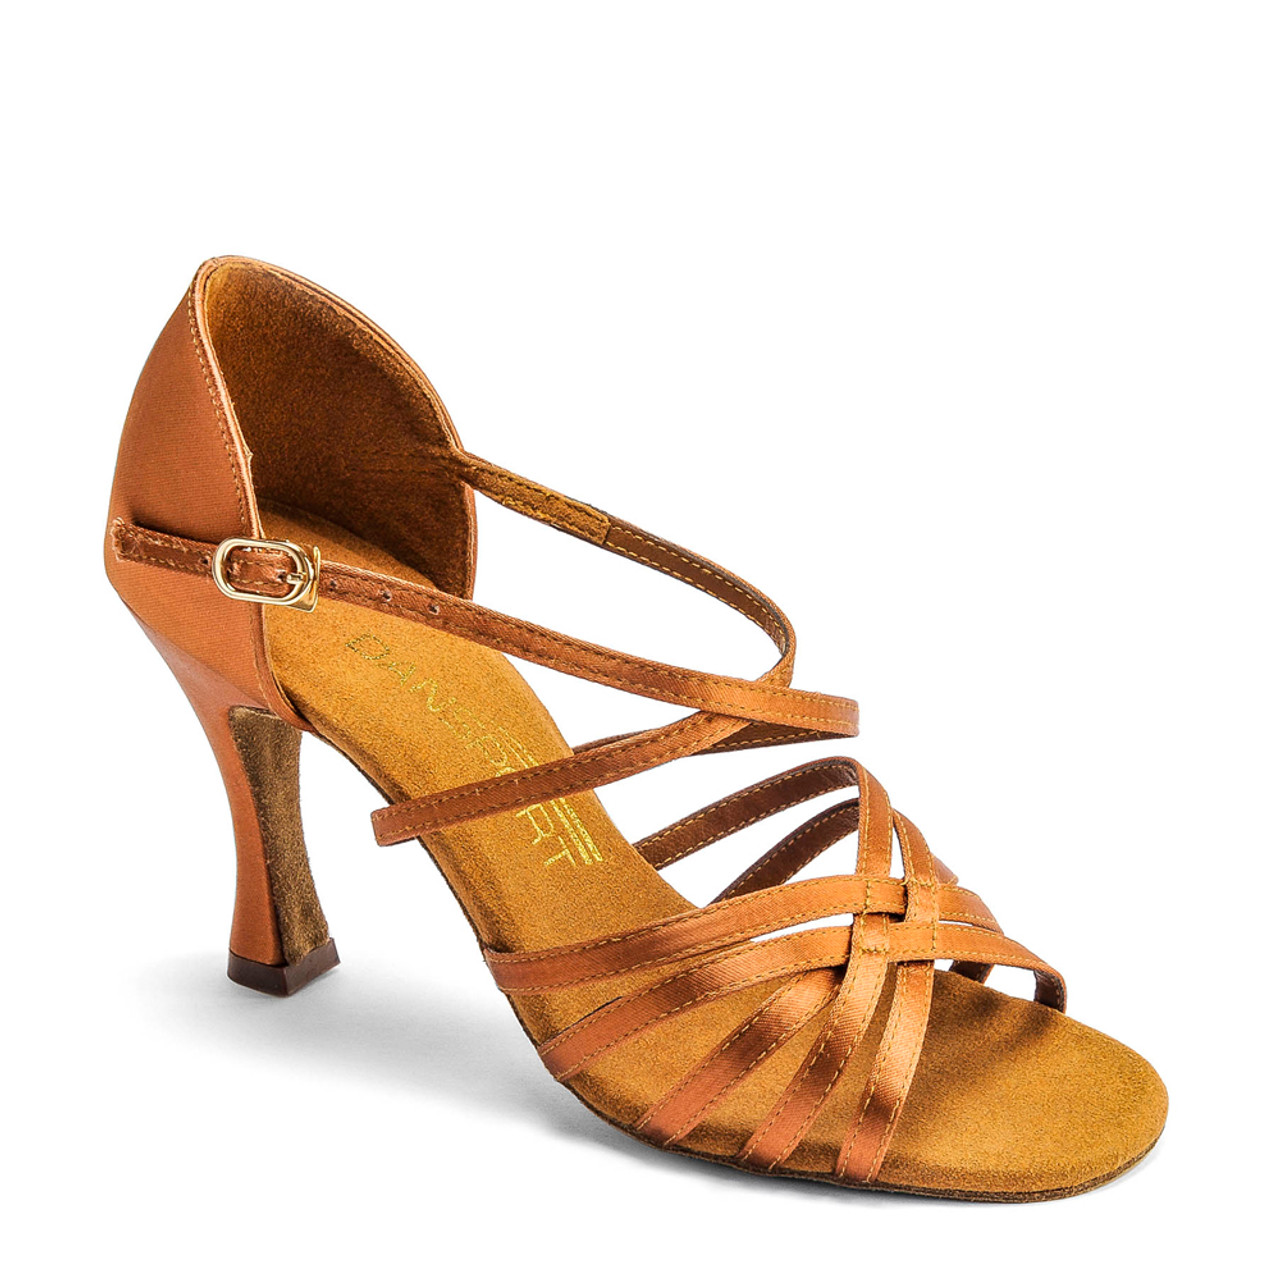 Details about  /Cindini Ladies Latin Salsa Tango Show Wedding Dance Shoe L32735 Flesh 85mm